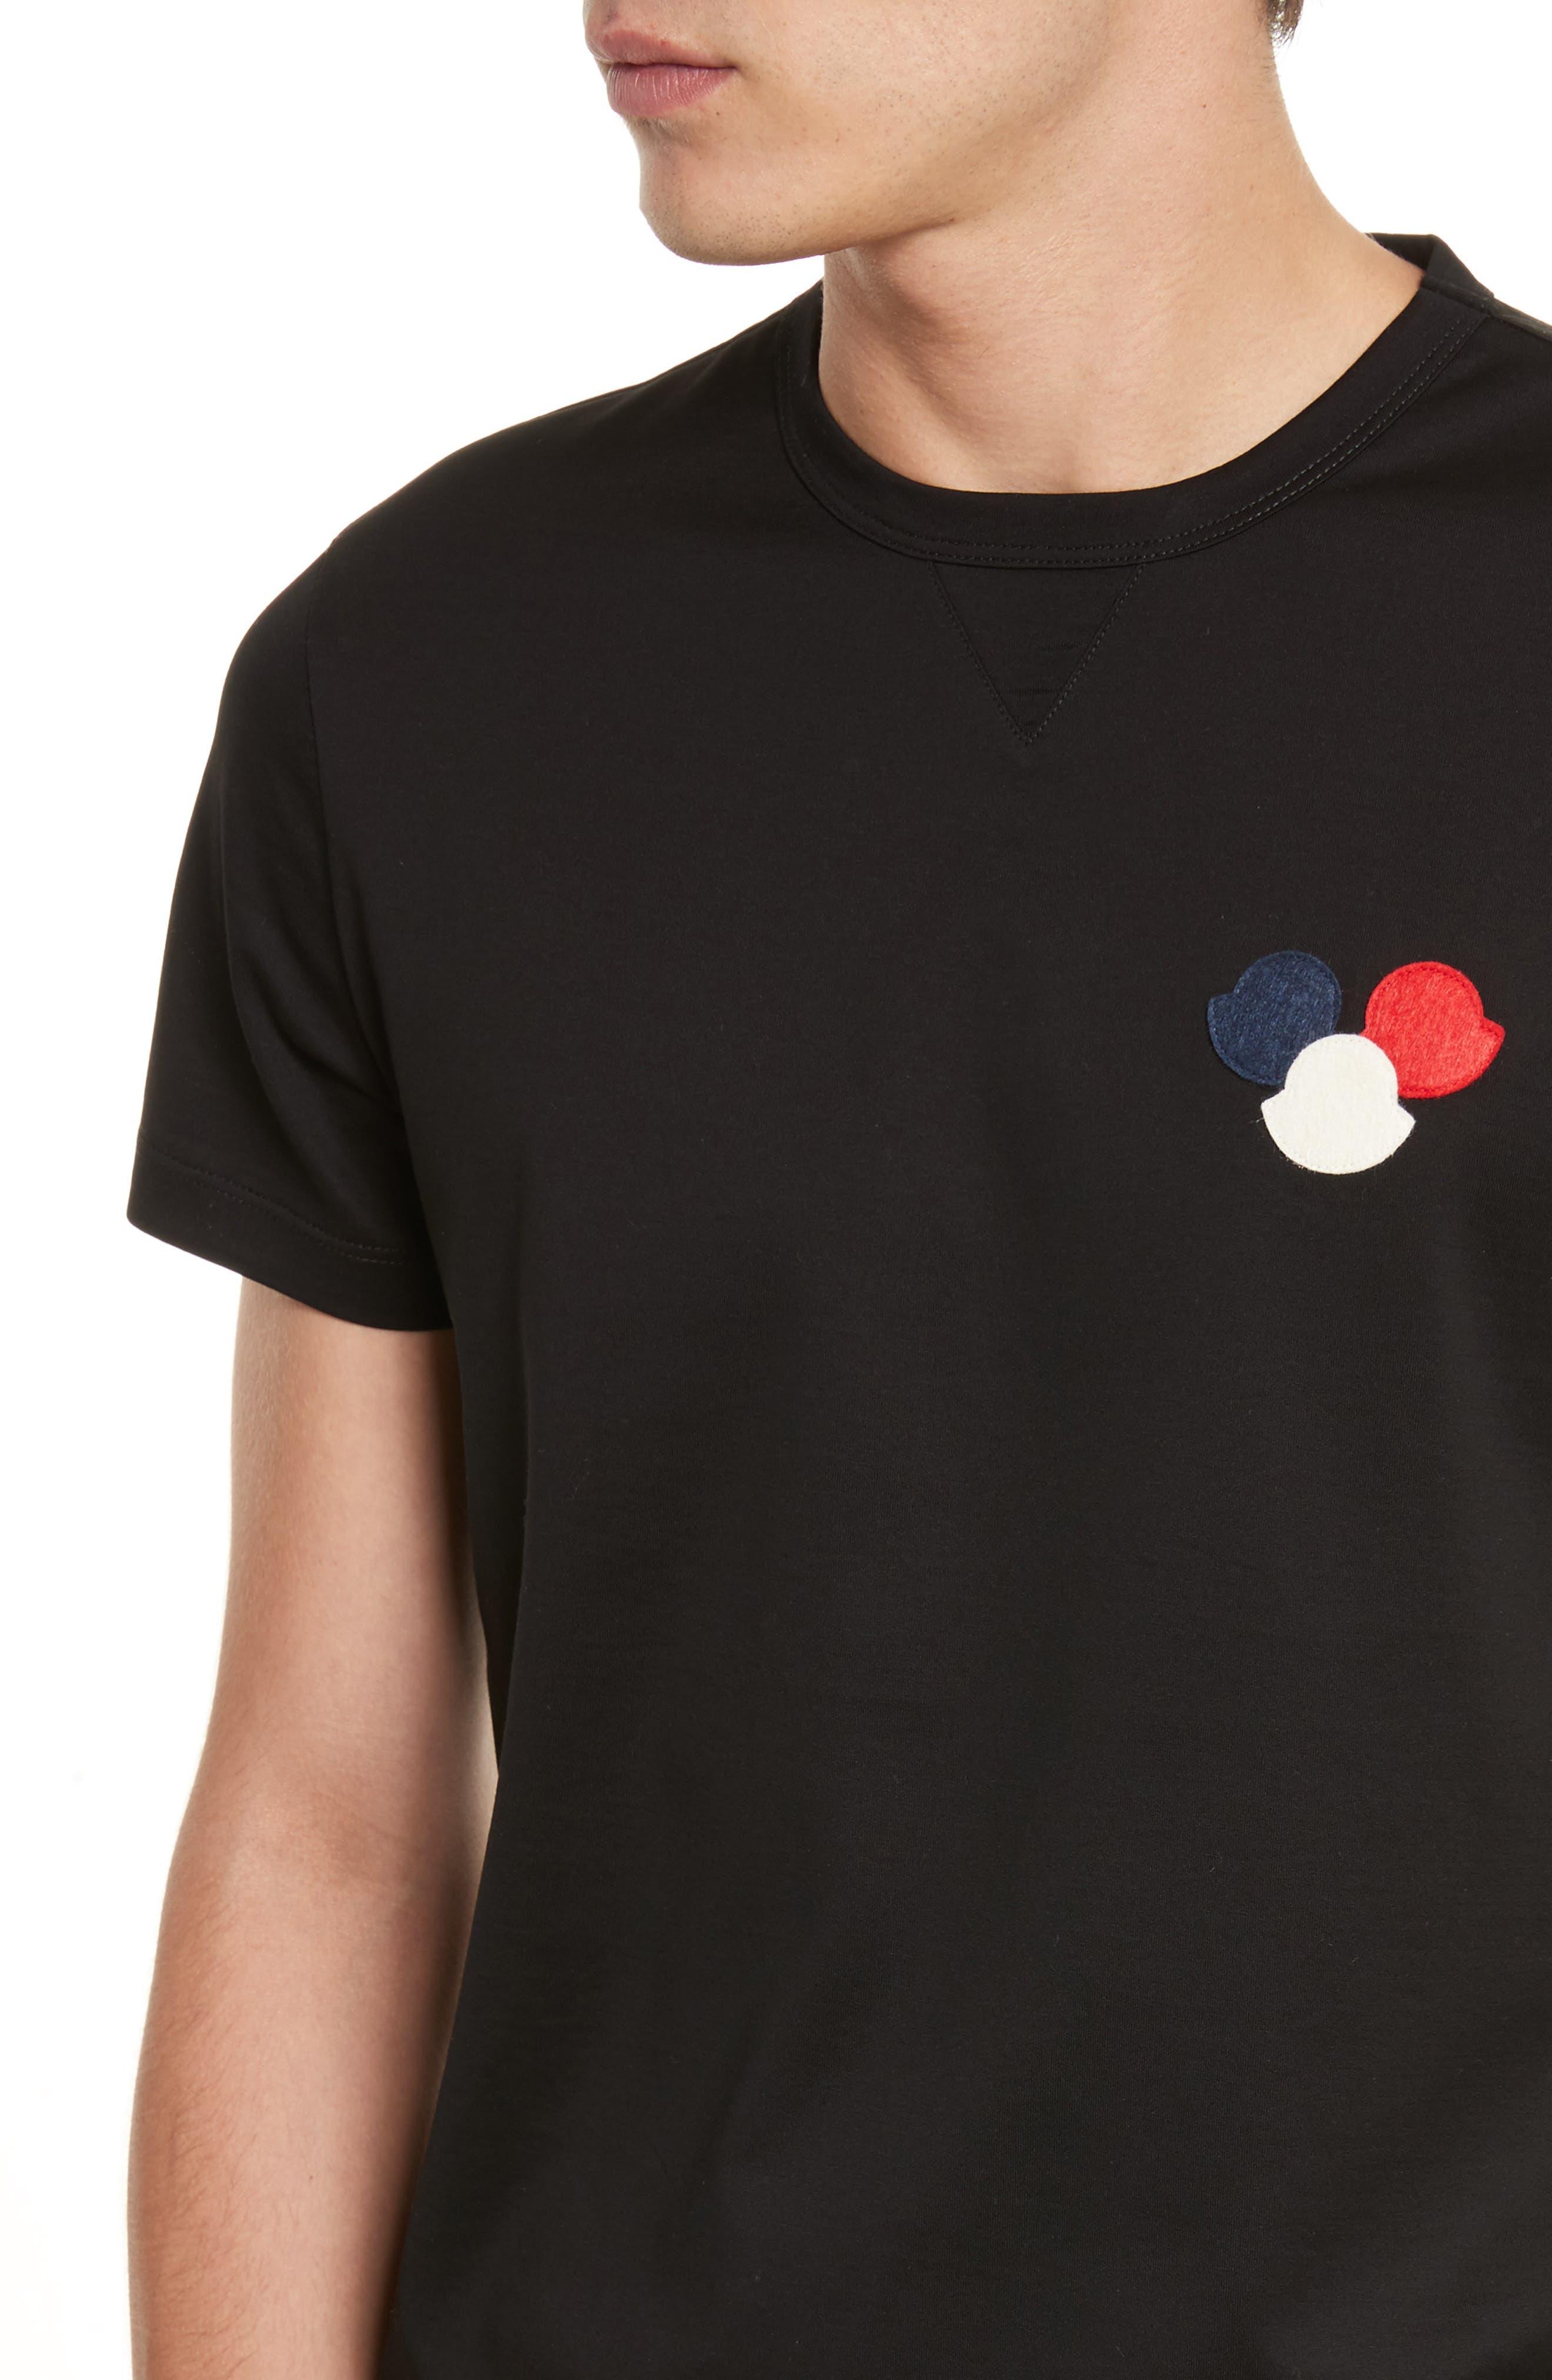 Bells T-Shirt,                             Alternate thumbnail 11, color,